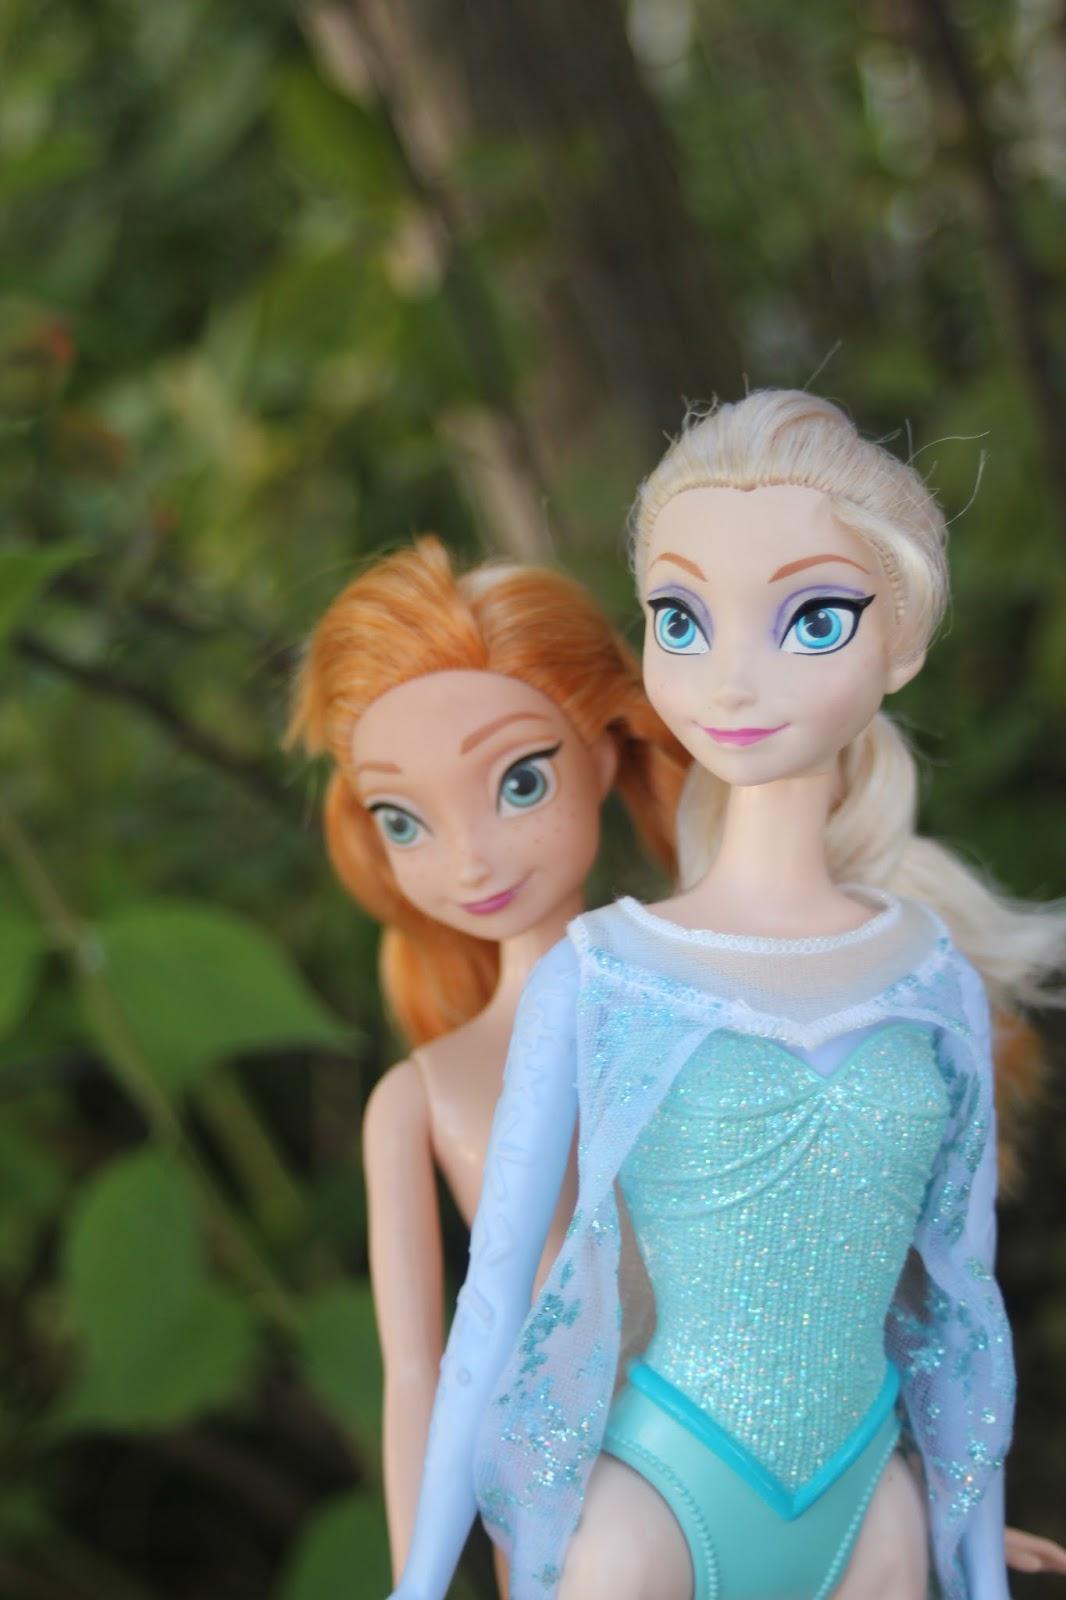 5cf4f2f4bc PLANET OF THE DOLLS  Doll-A-Day 2017  152 Disney Girls Anna